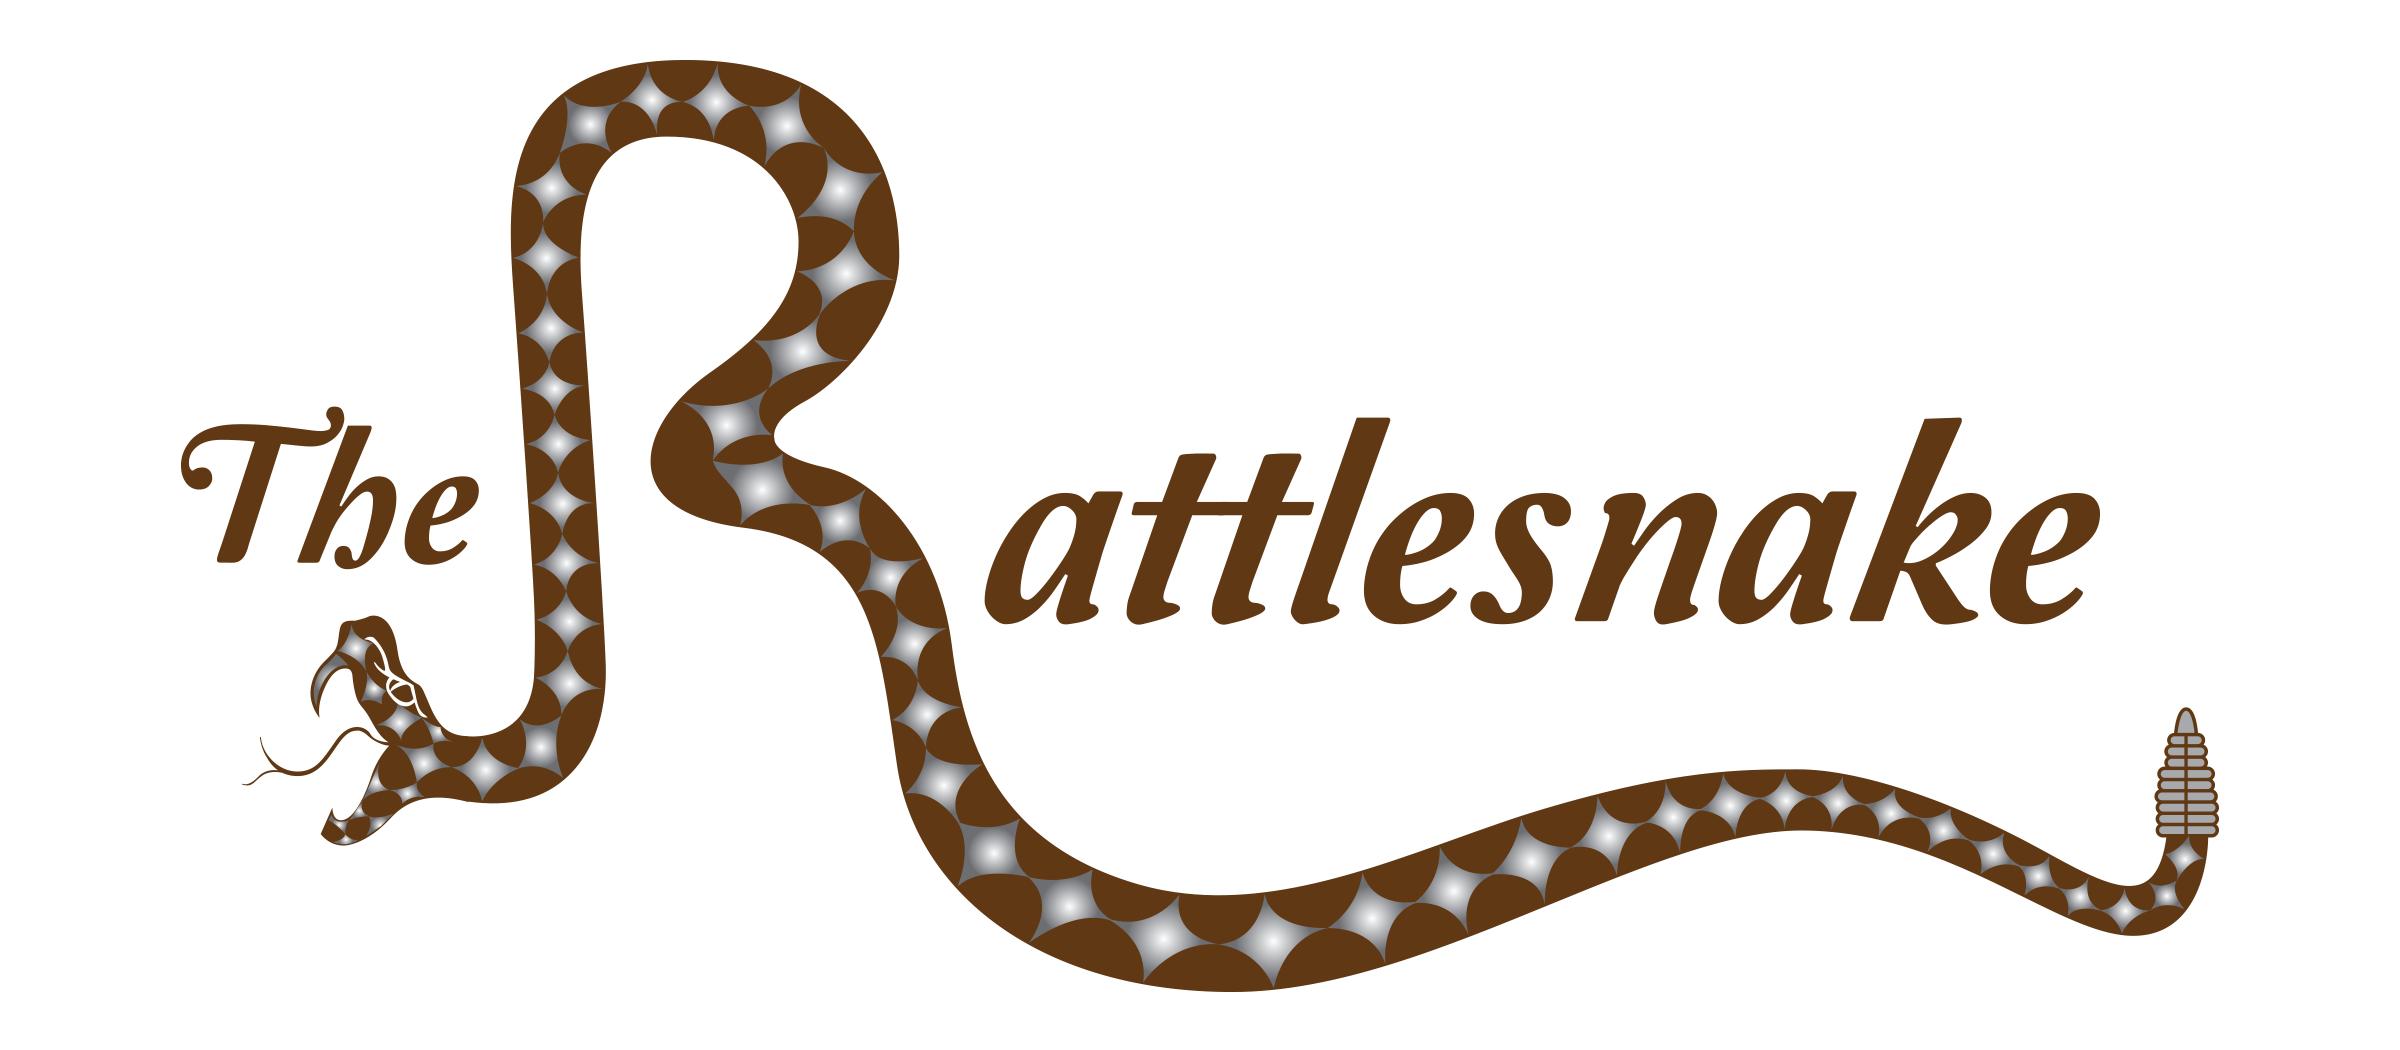 world patent marketing success team introduces rattlesnake